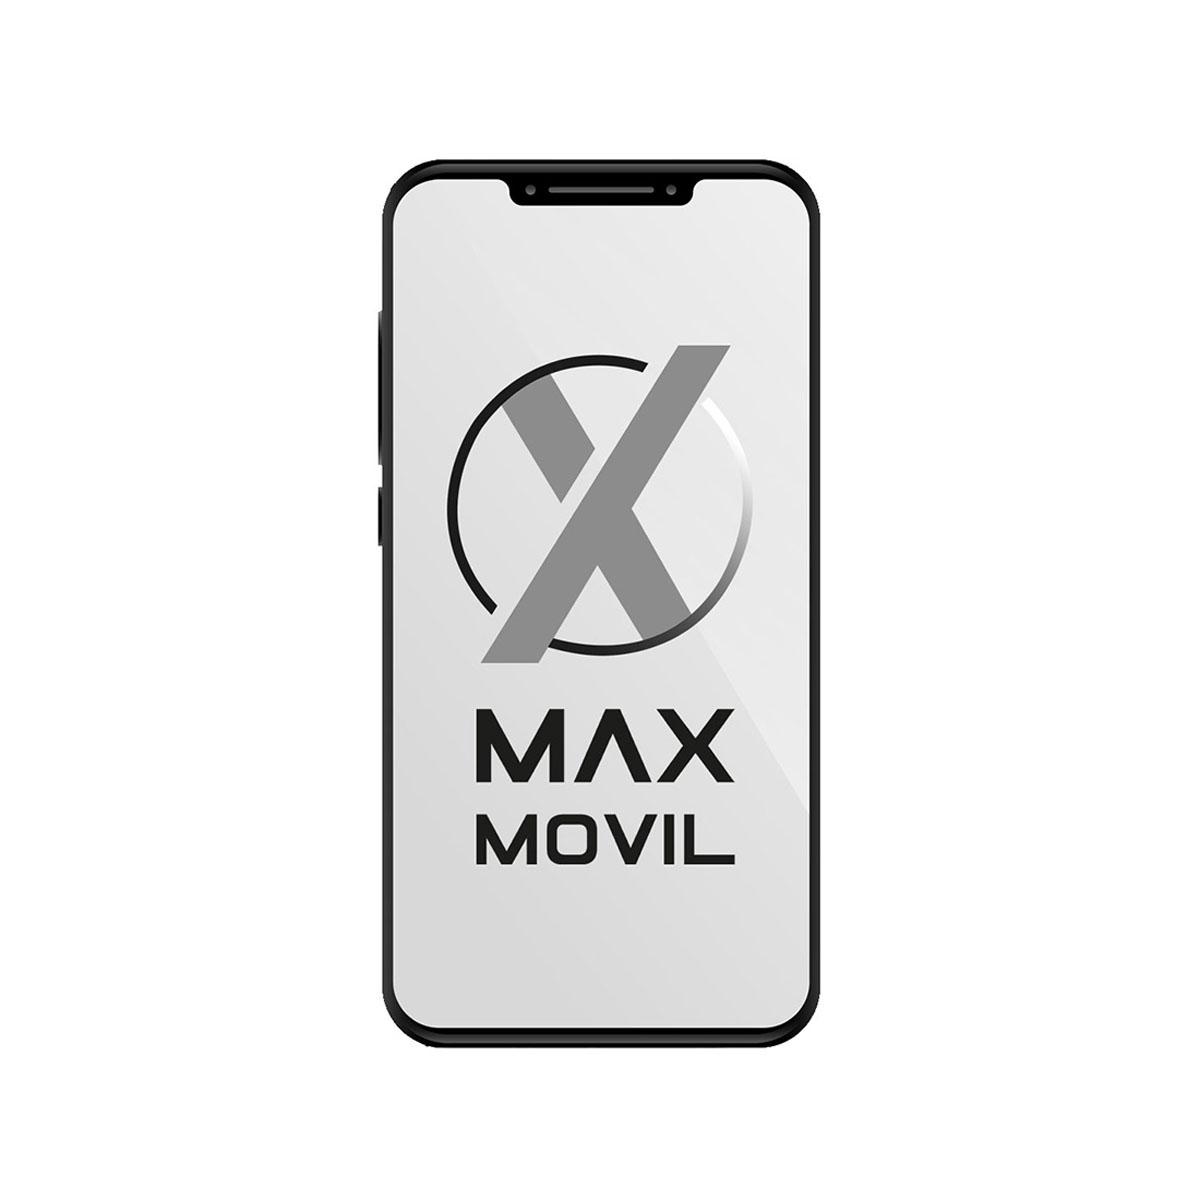 Sony Xperia XA Ultra 3GB/16GB Negro Dual SIM F3212